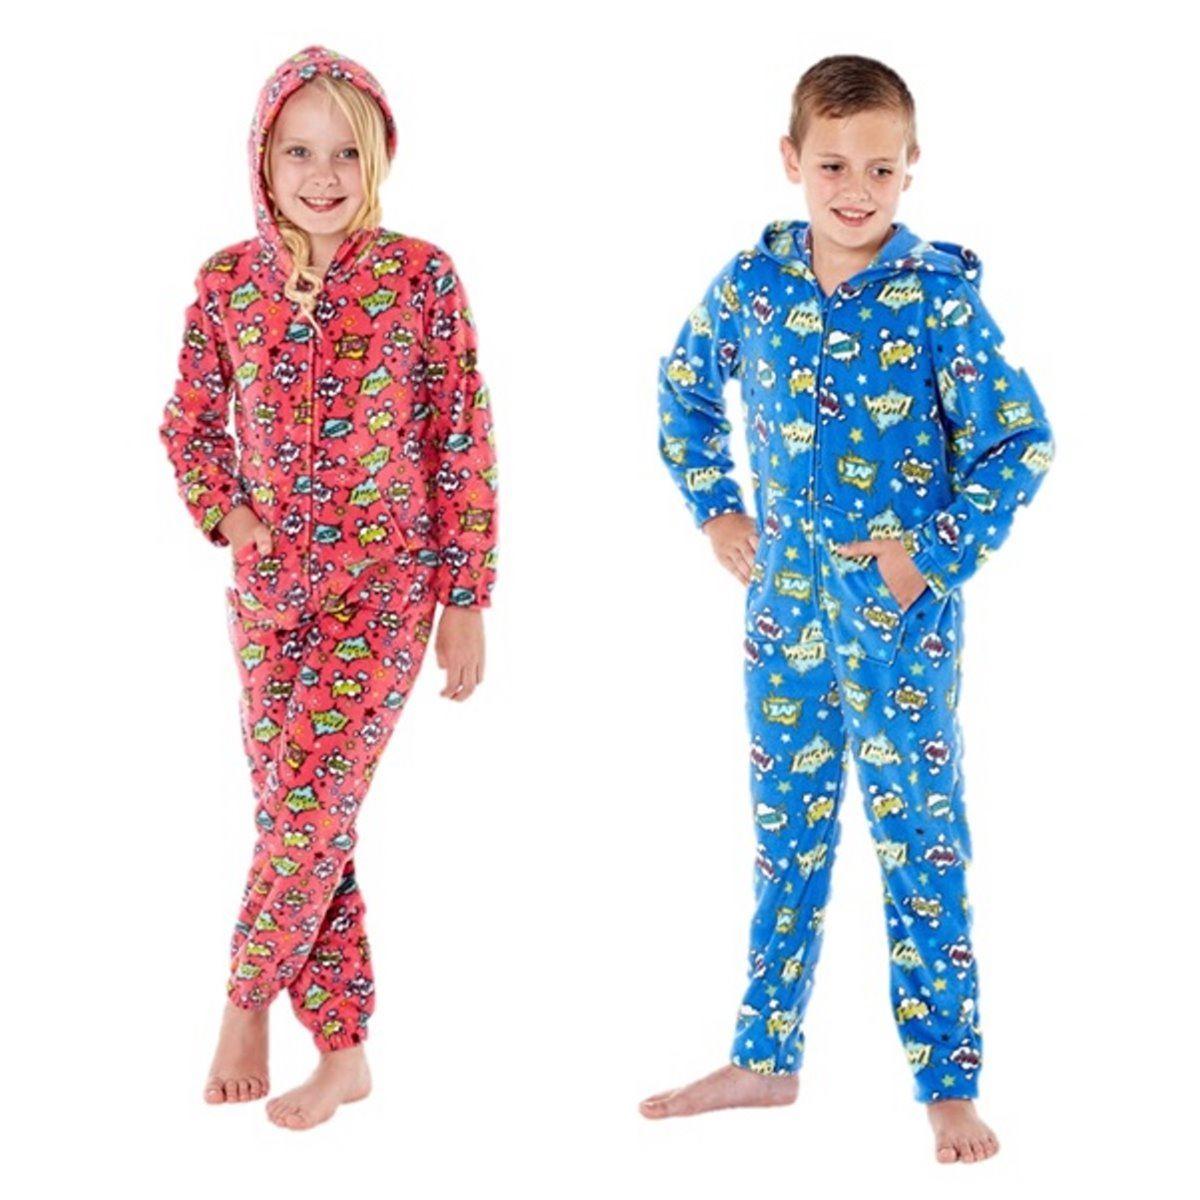 boys girls onesie fleece all in one pyjamas one piece. Black Bedroom Furniture Sets. Home Design Ideas